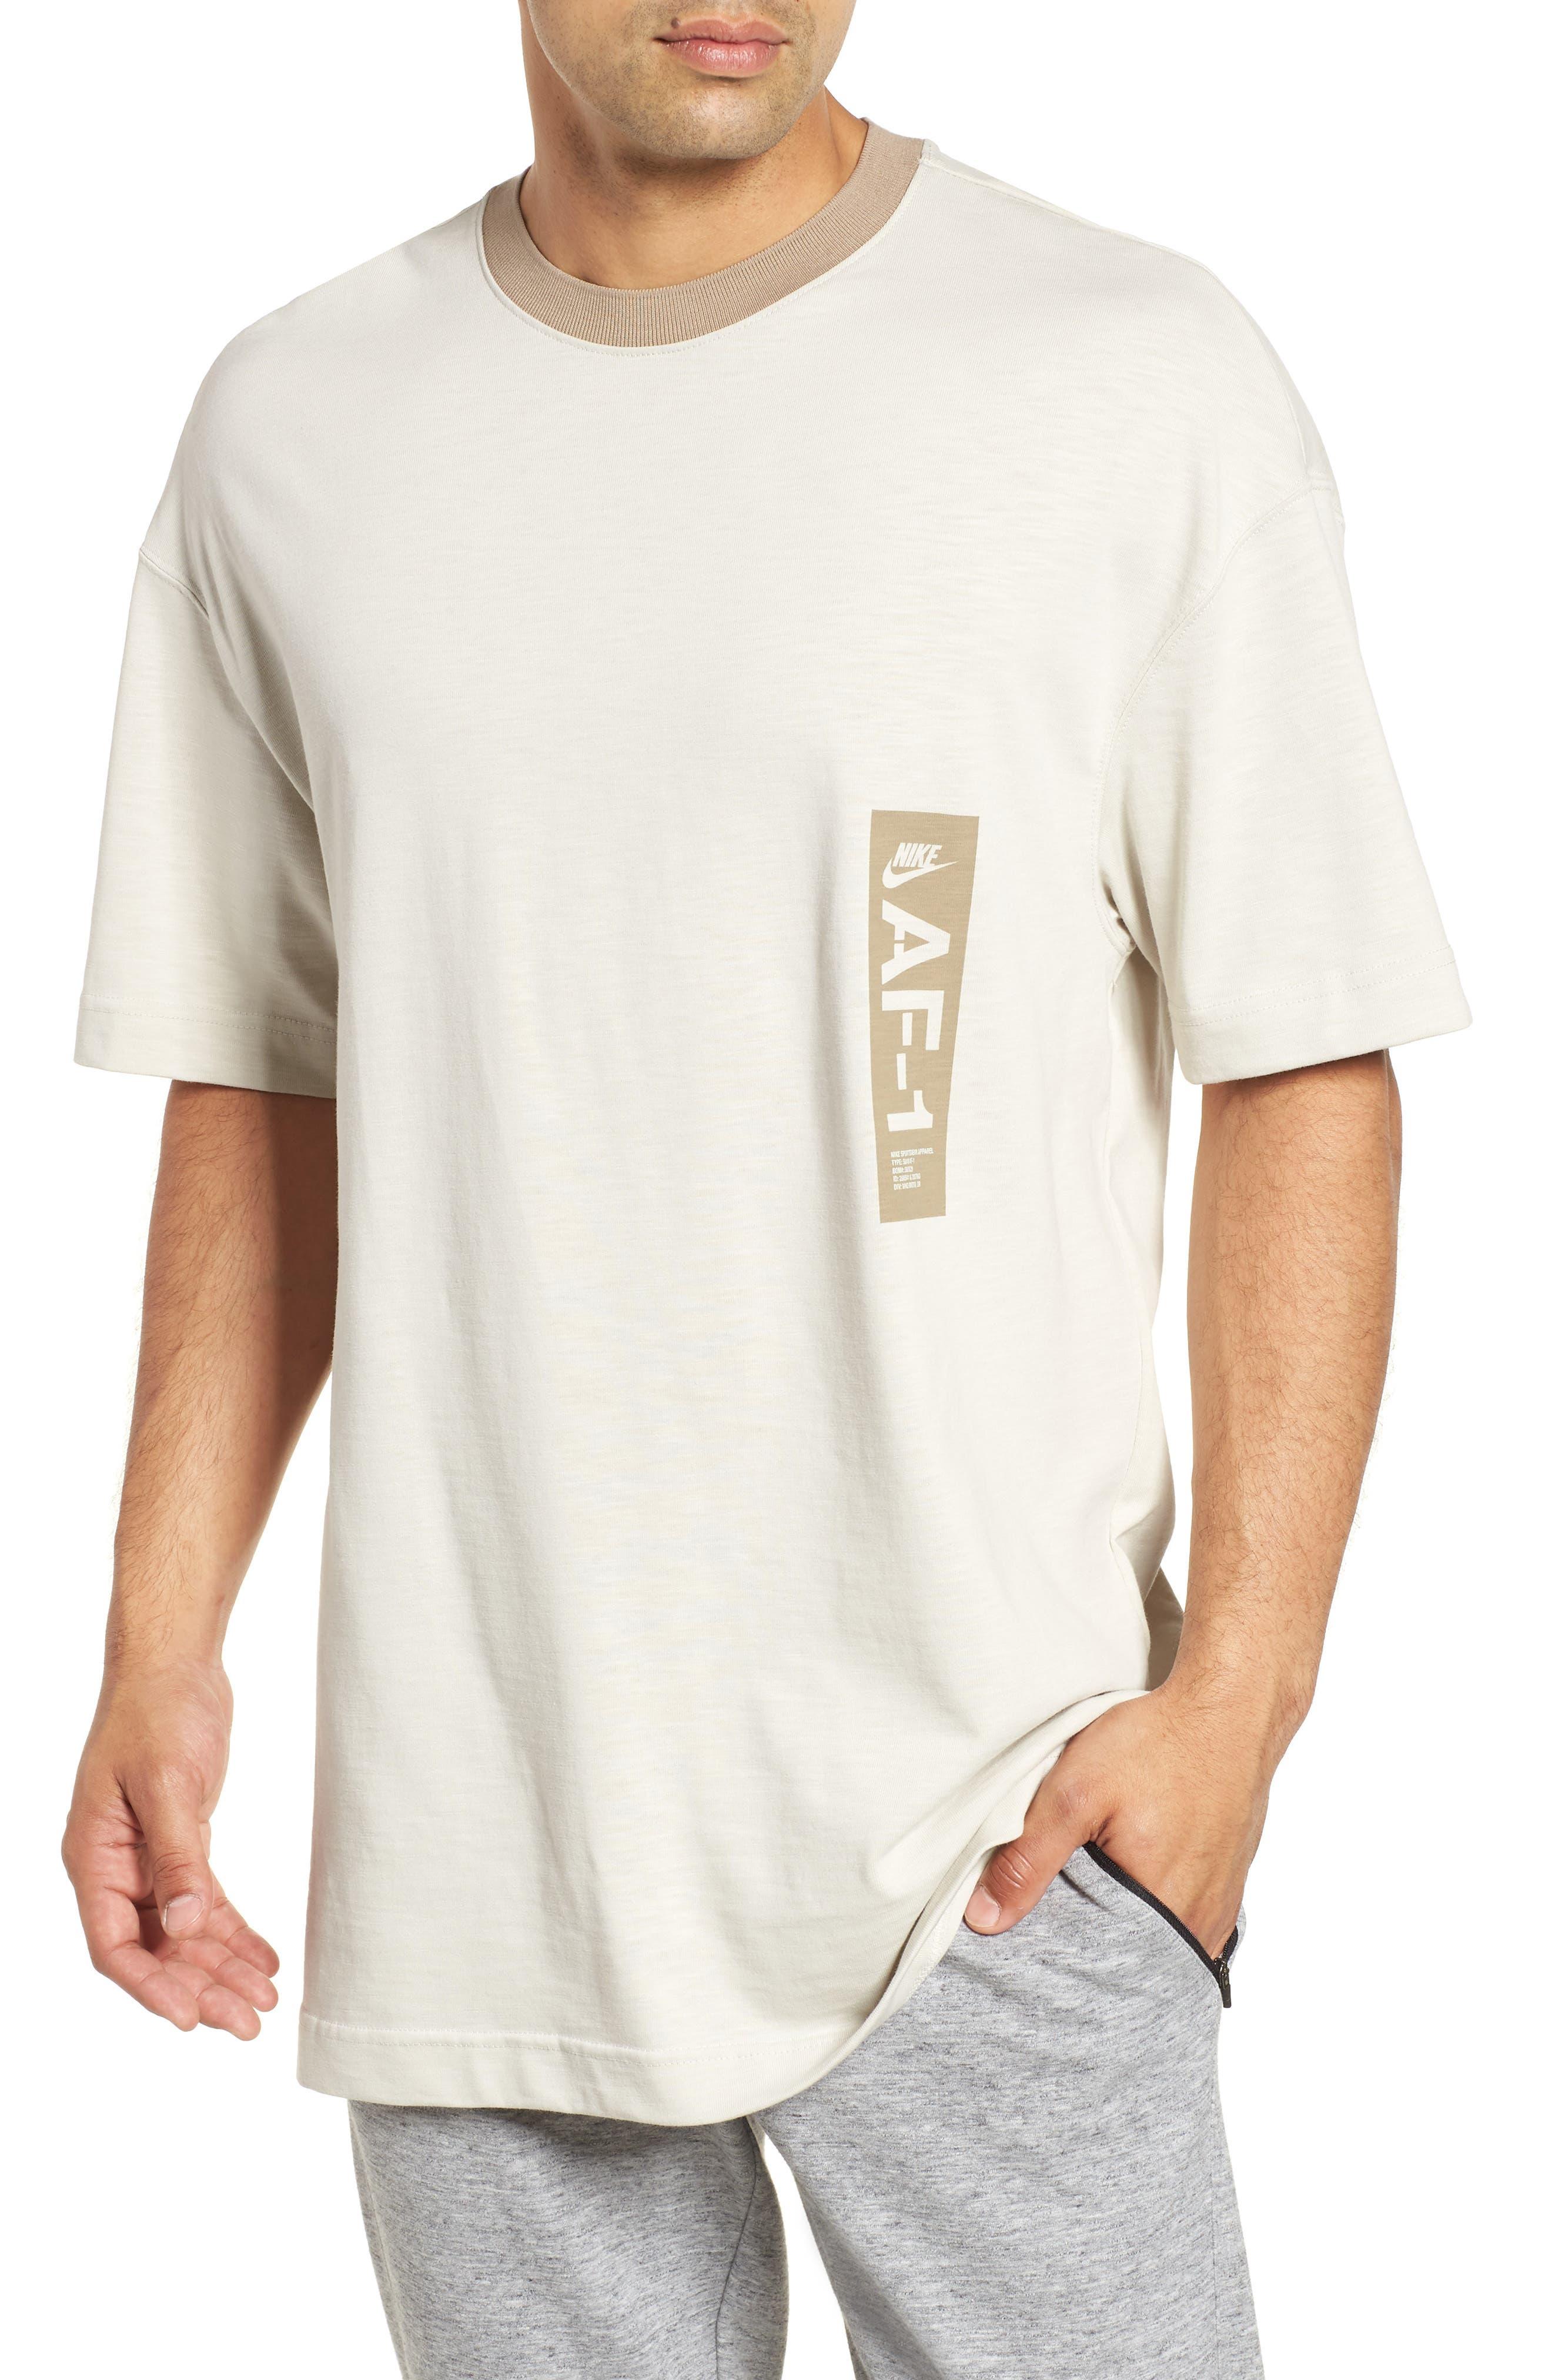 Sportswear AF1 Graphic T-Shirt,                         Main,                         color, LIGHT BONE/ KHAKI